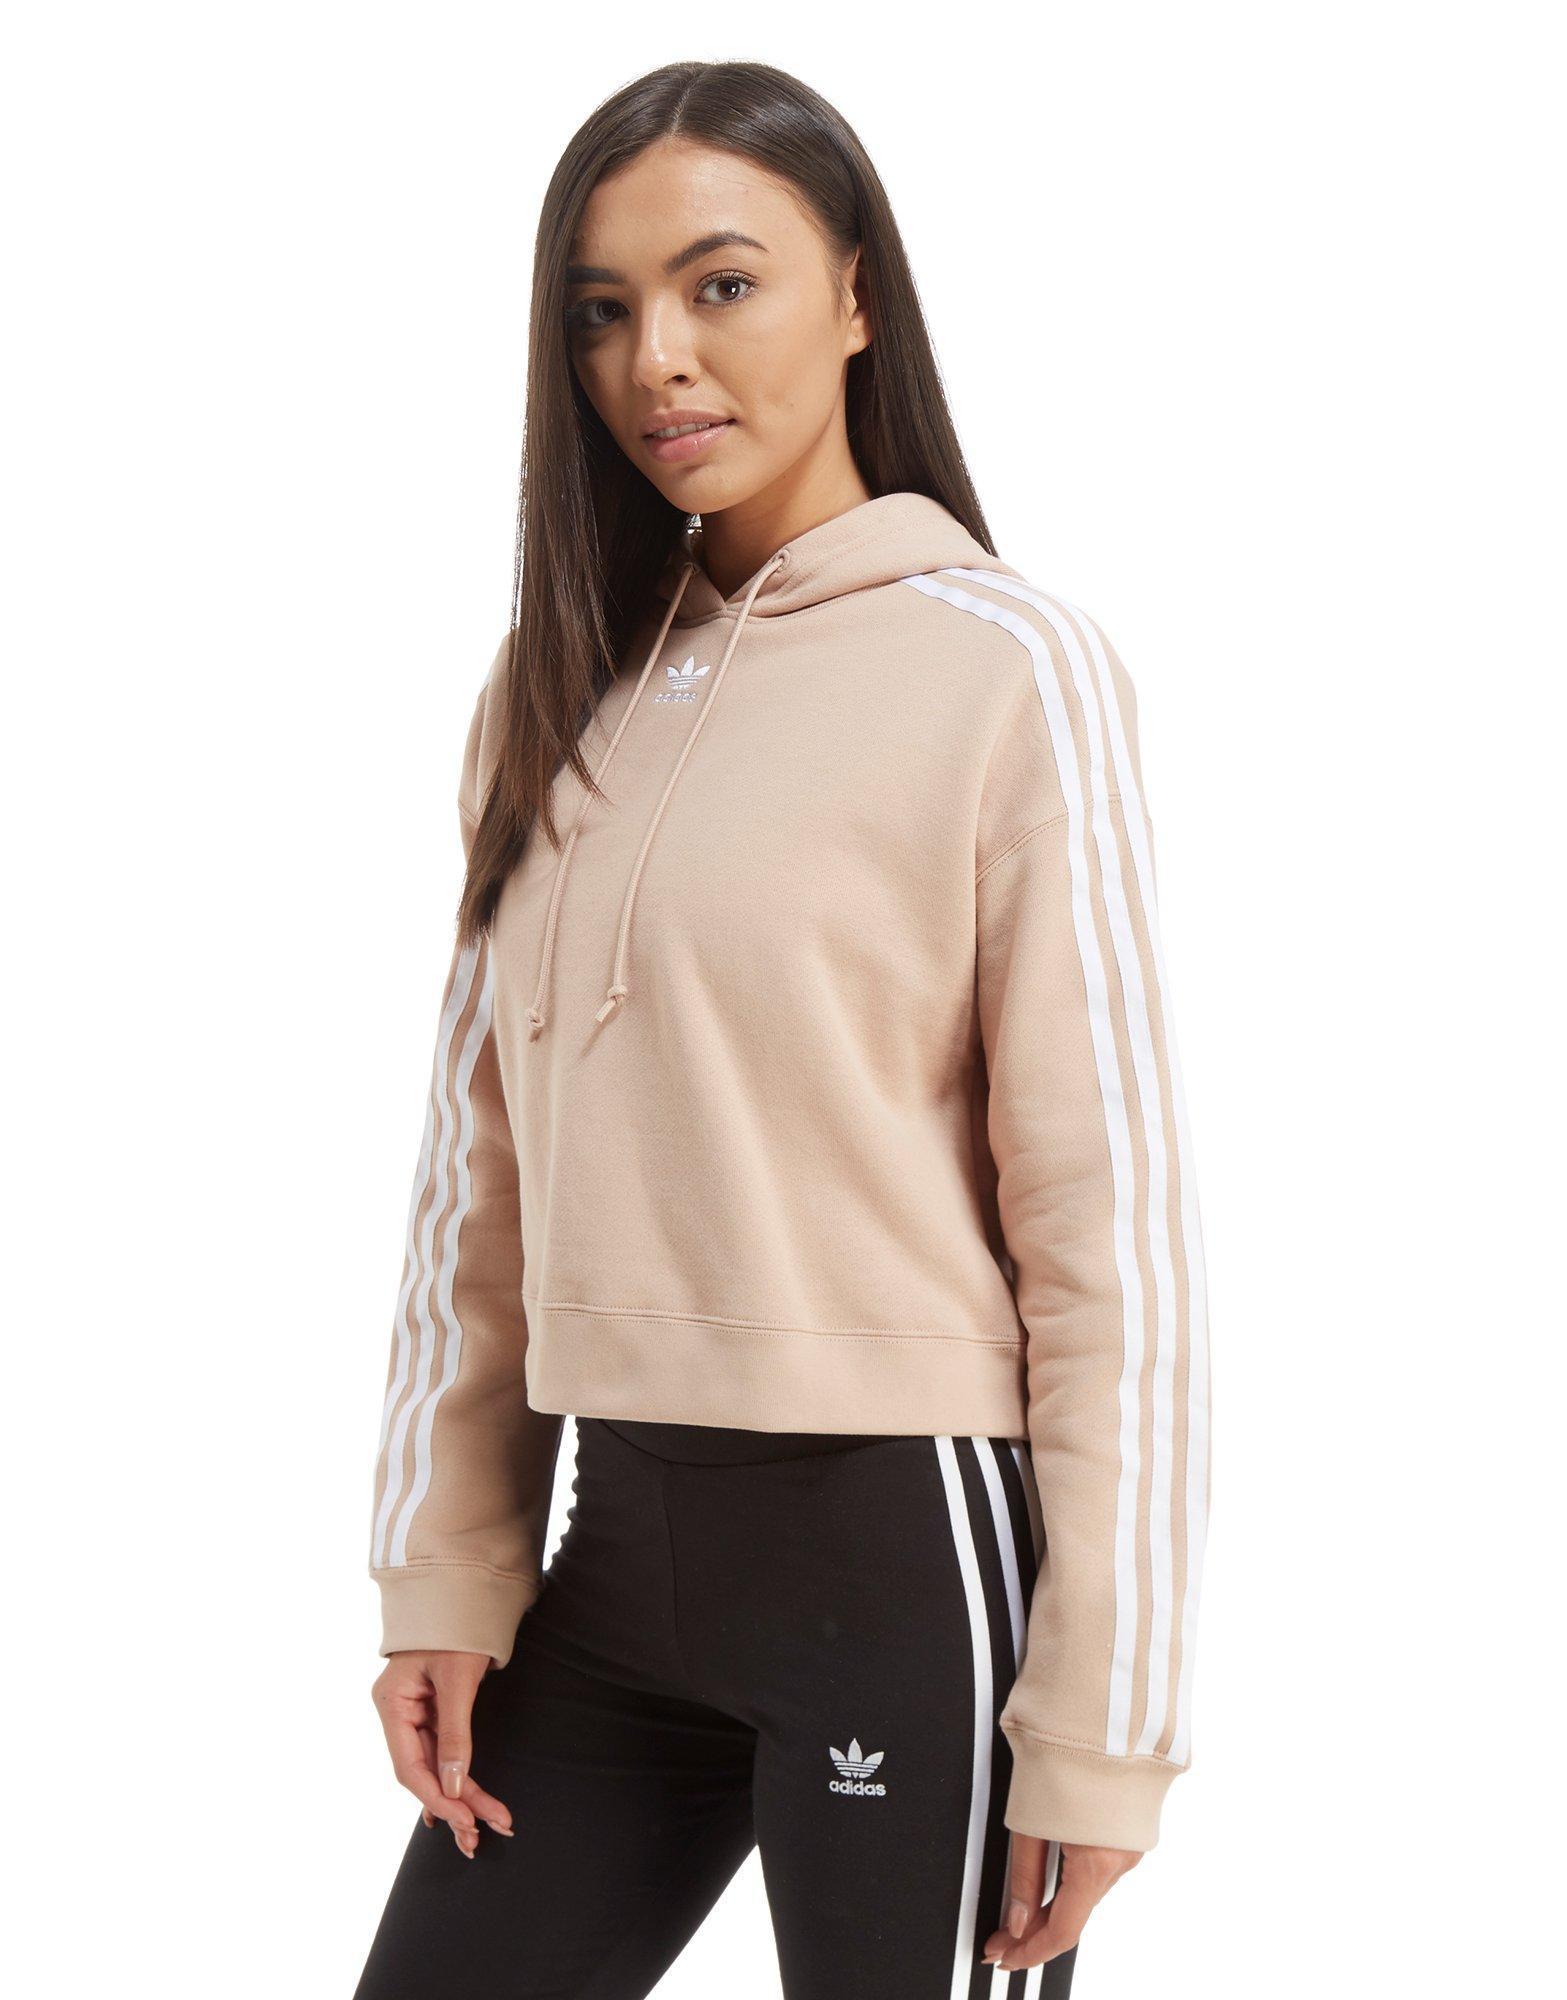 6726eedb Adidas Originals Pink 3-stripes Crop Overhead Hoodie